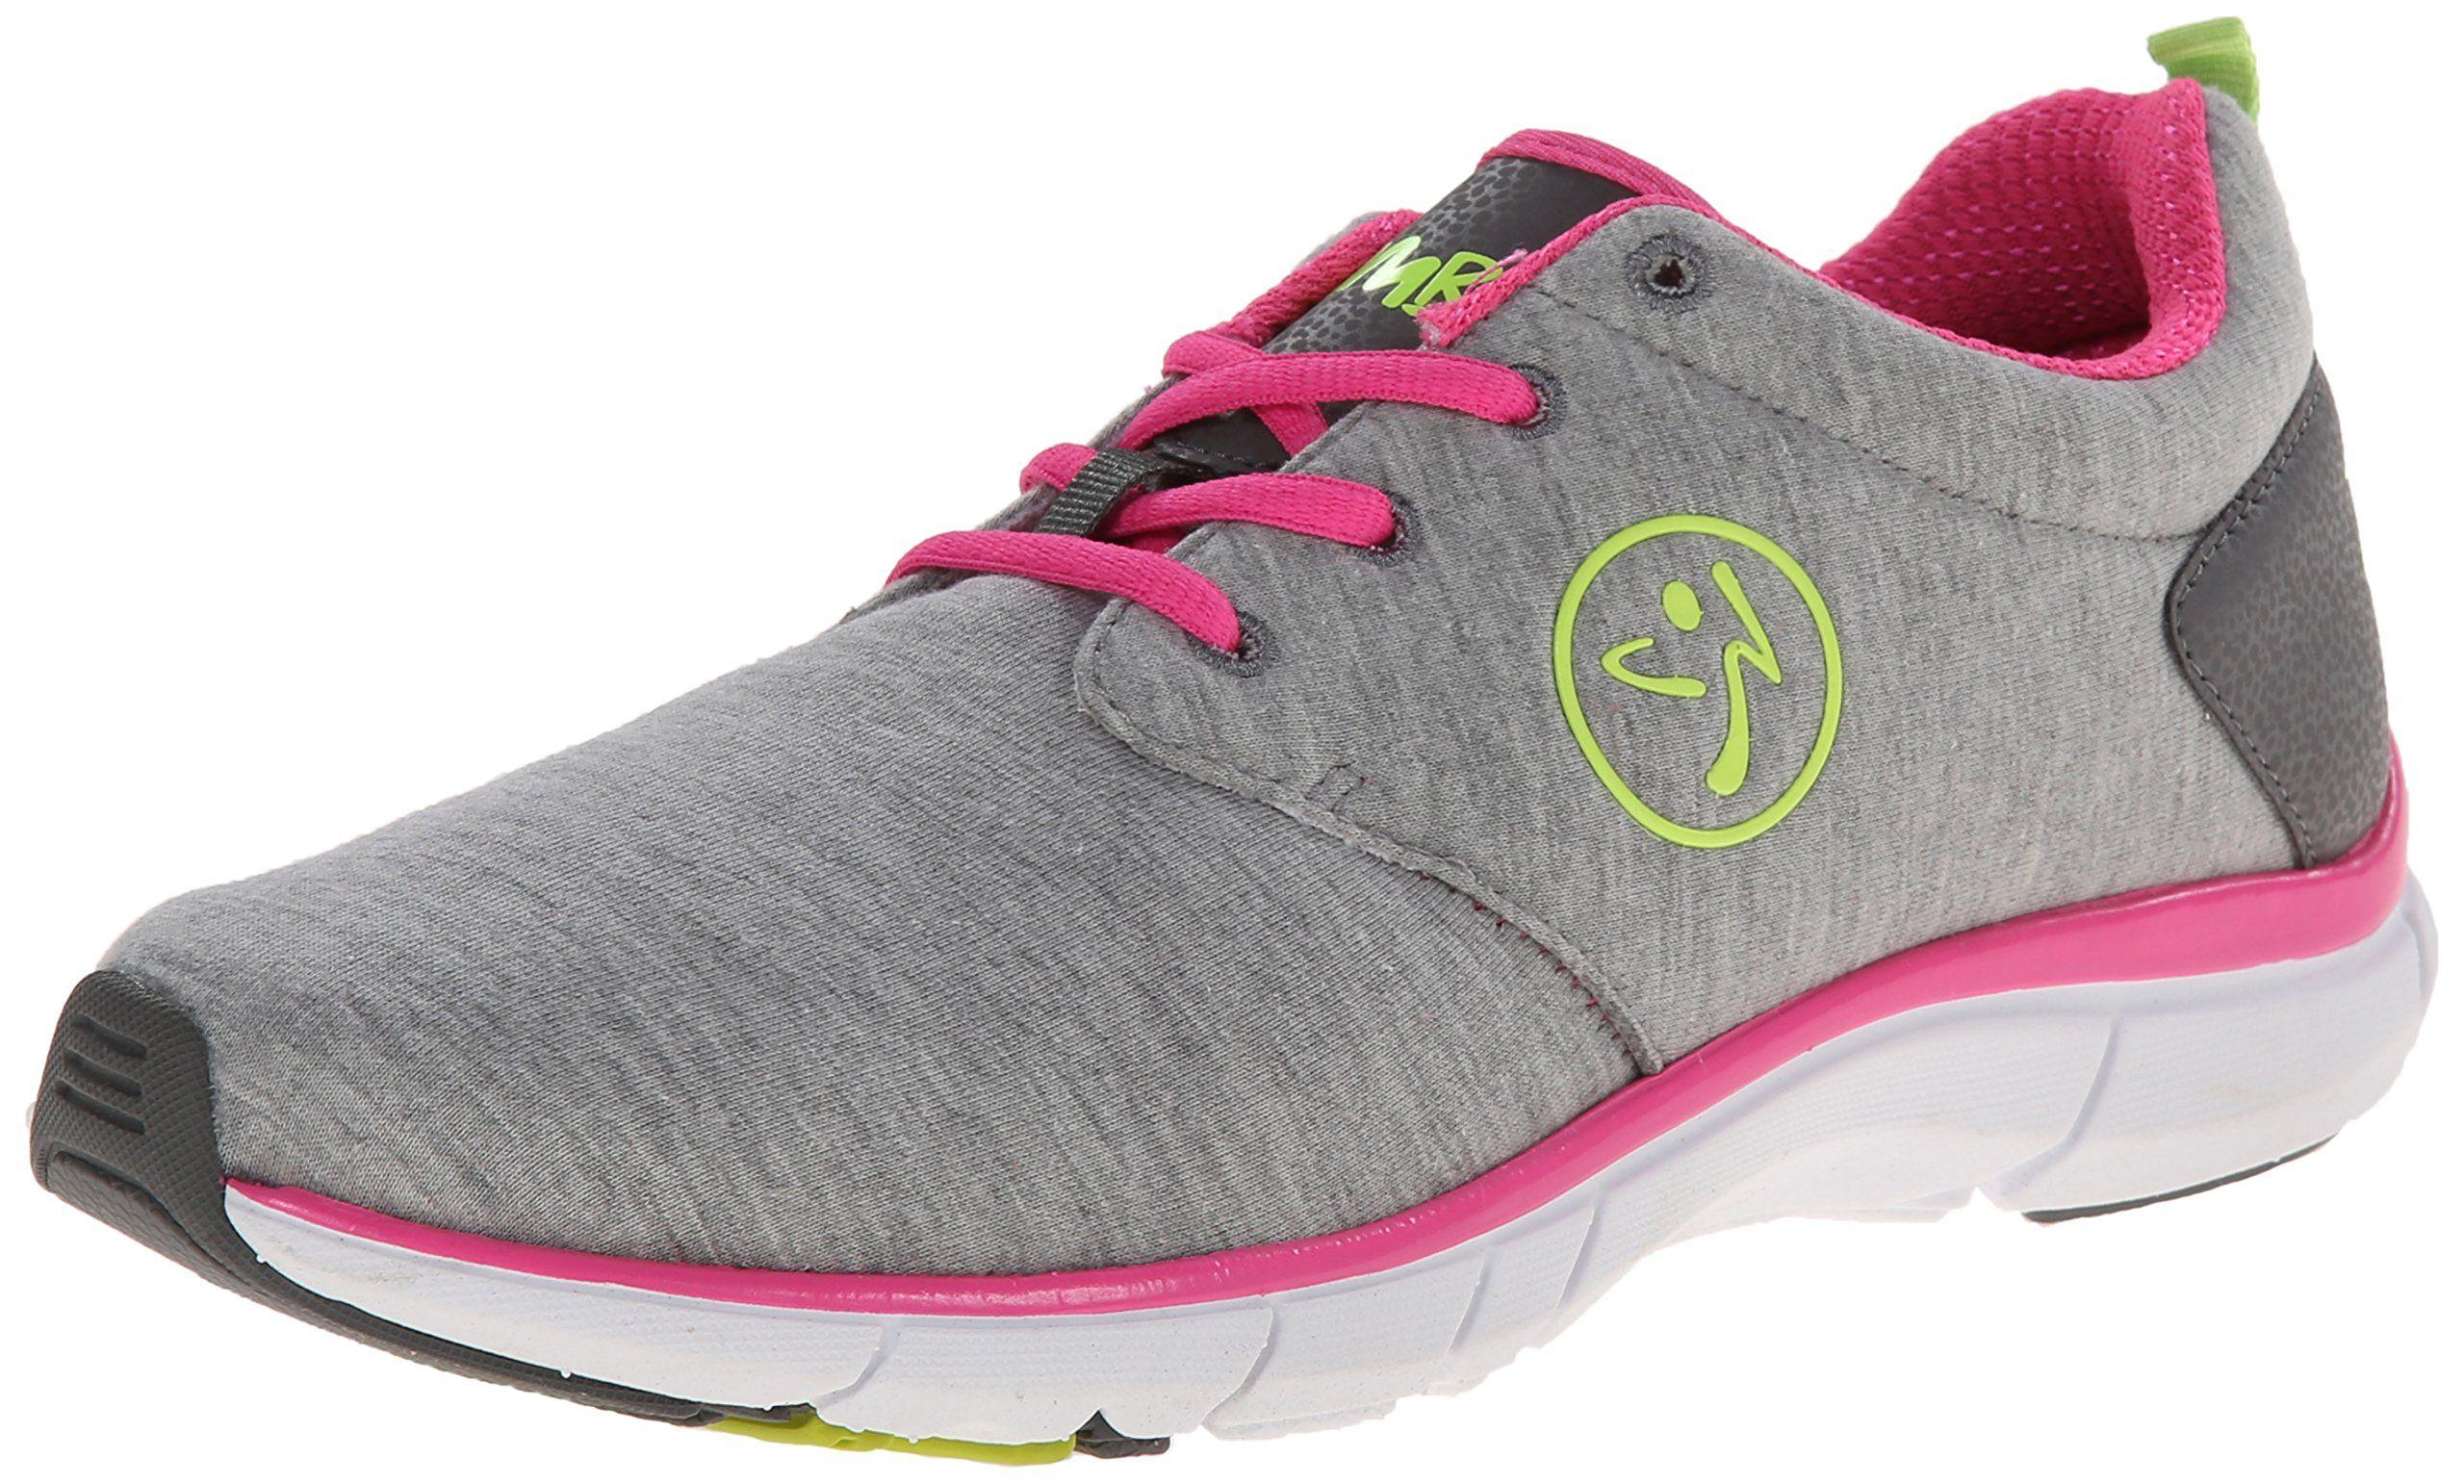 Dance sneakers, Nice shoes, Zumba shoes